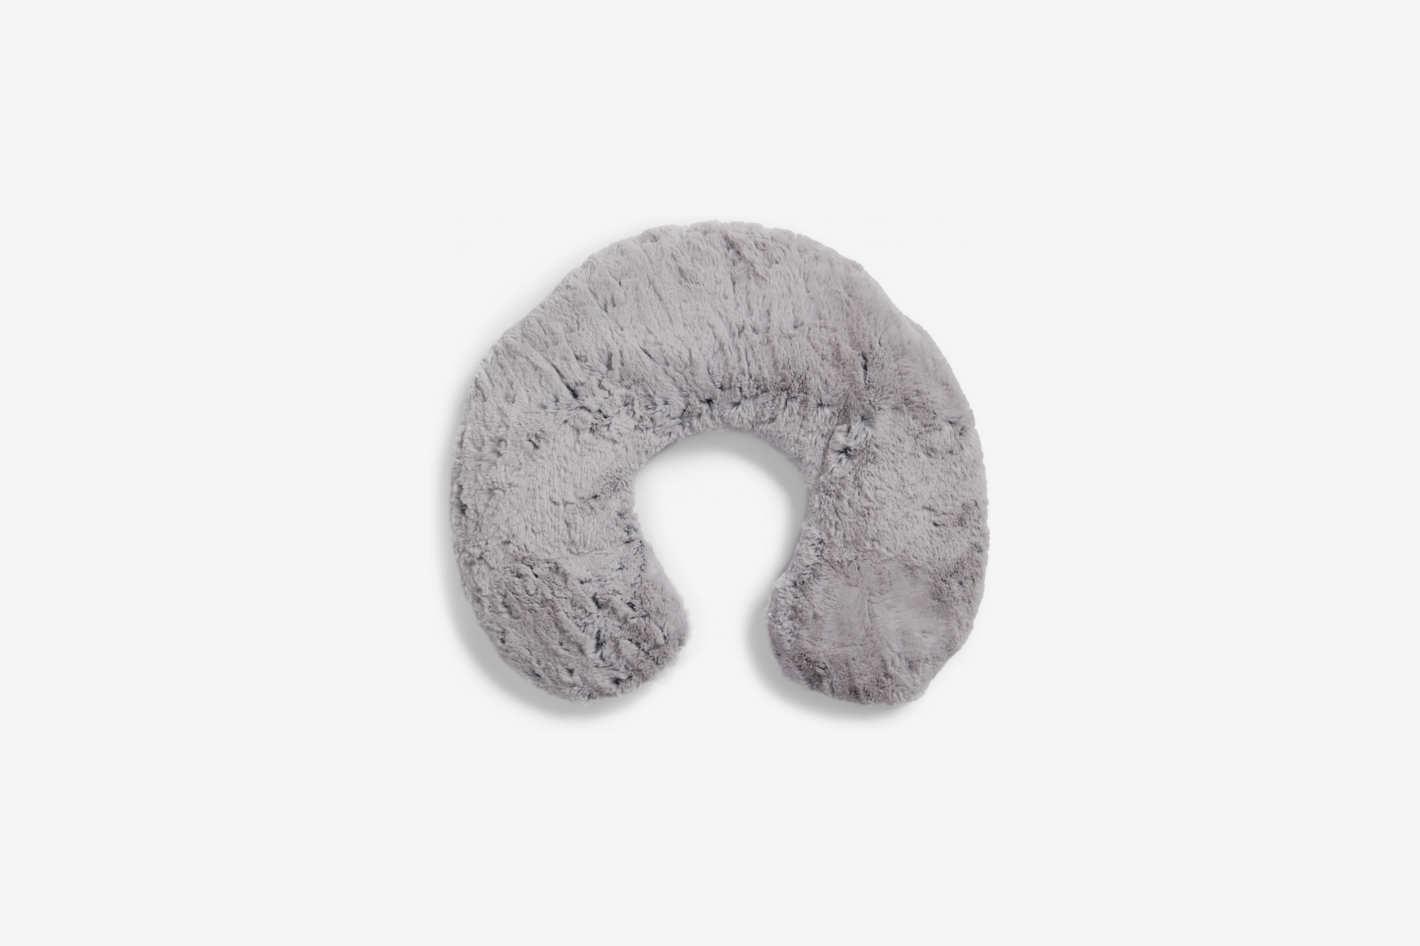 Sonoma Lavender Marbled Onyx Neck Pillow